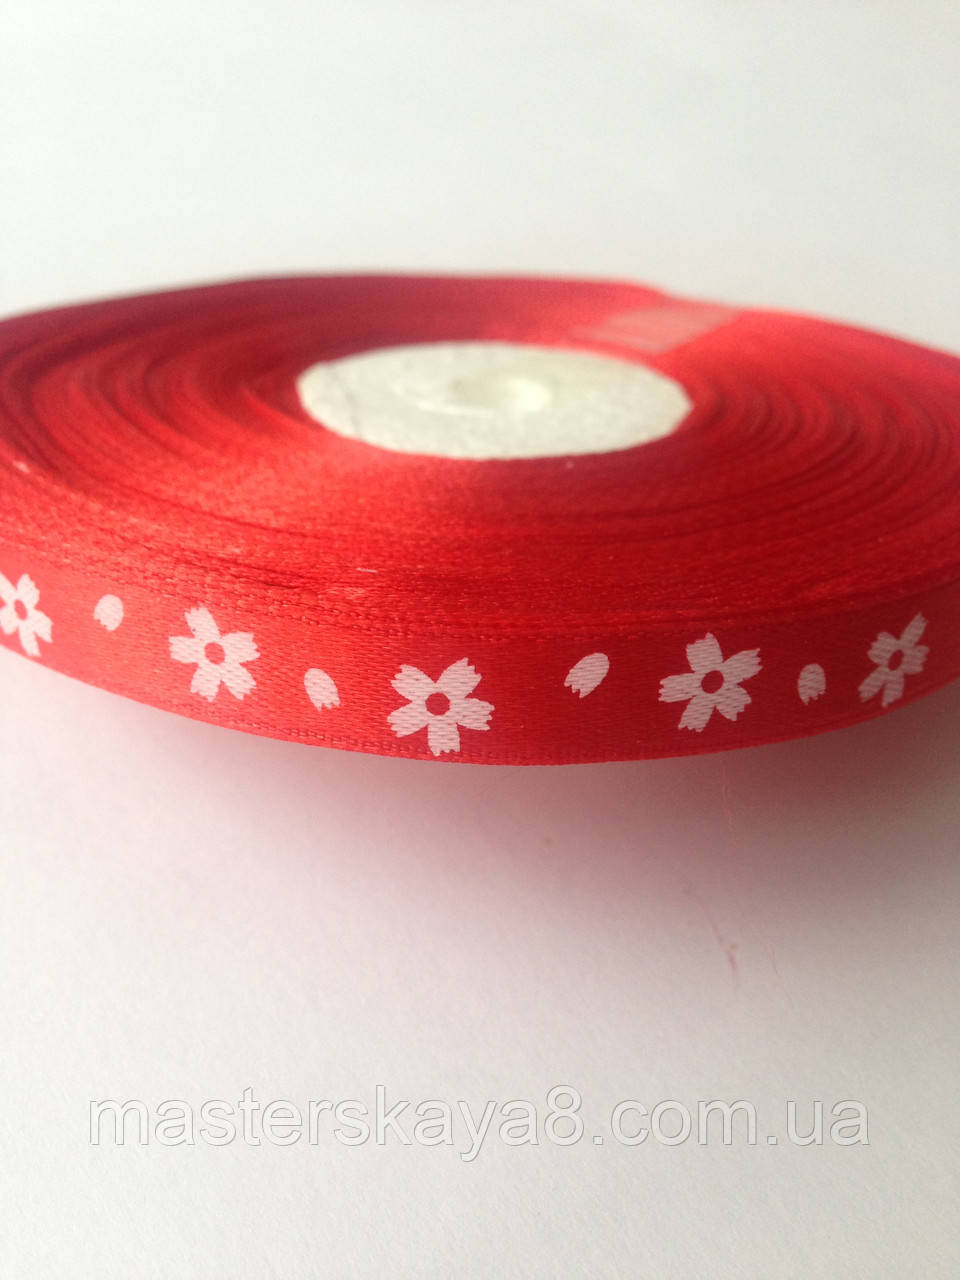 Лента атласная красная с крупными цветами 1 см